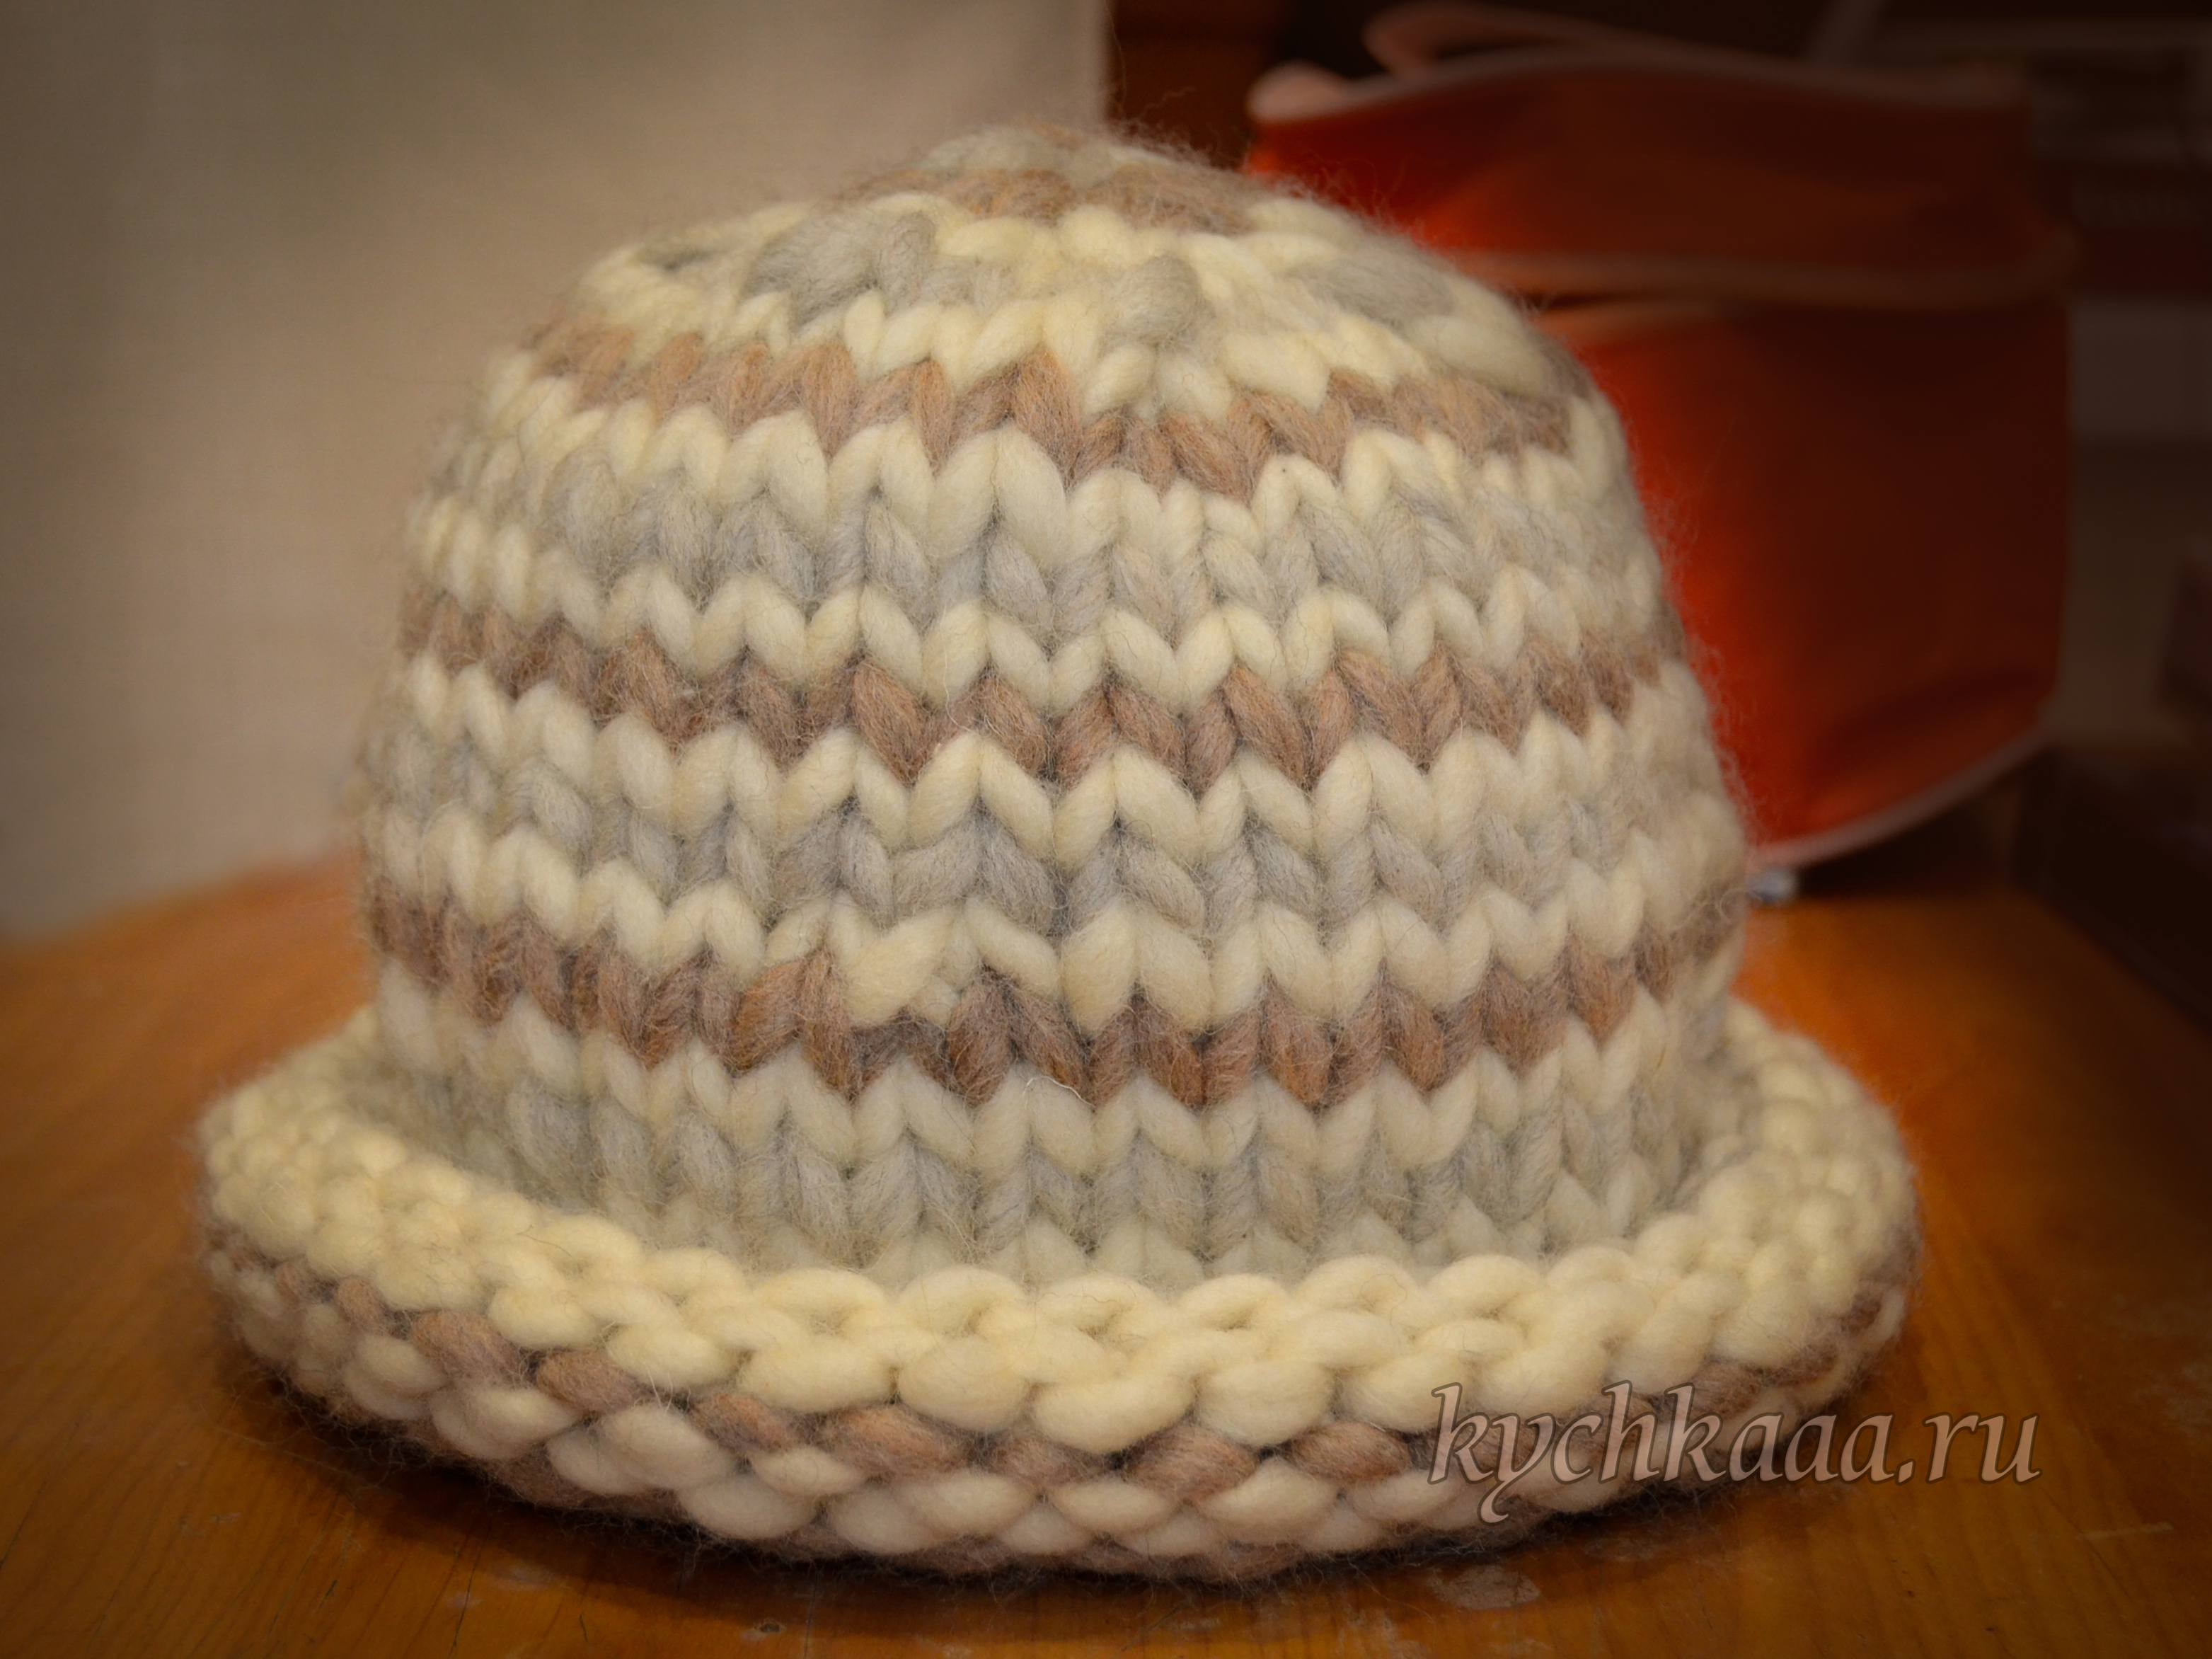 Тёплая шапка из объёмной пряжи Gazzal marino